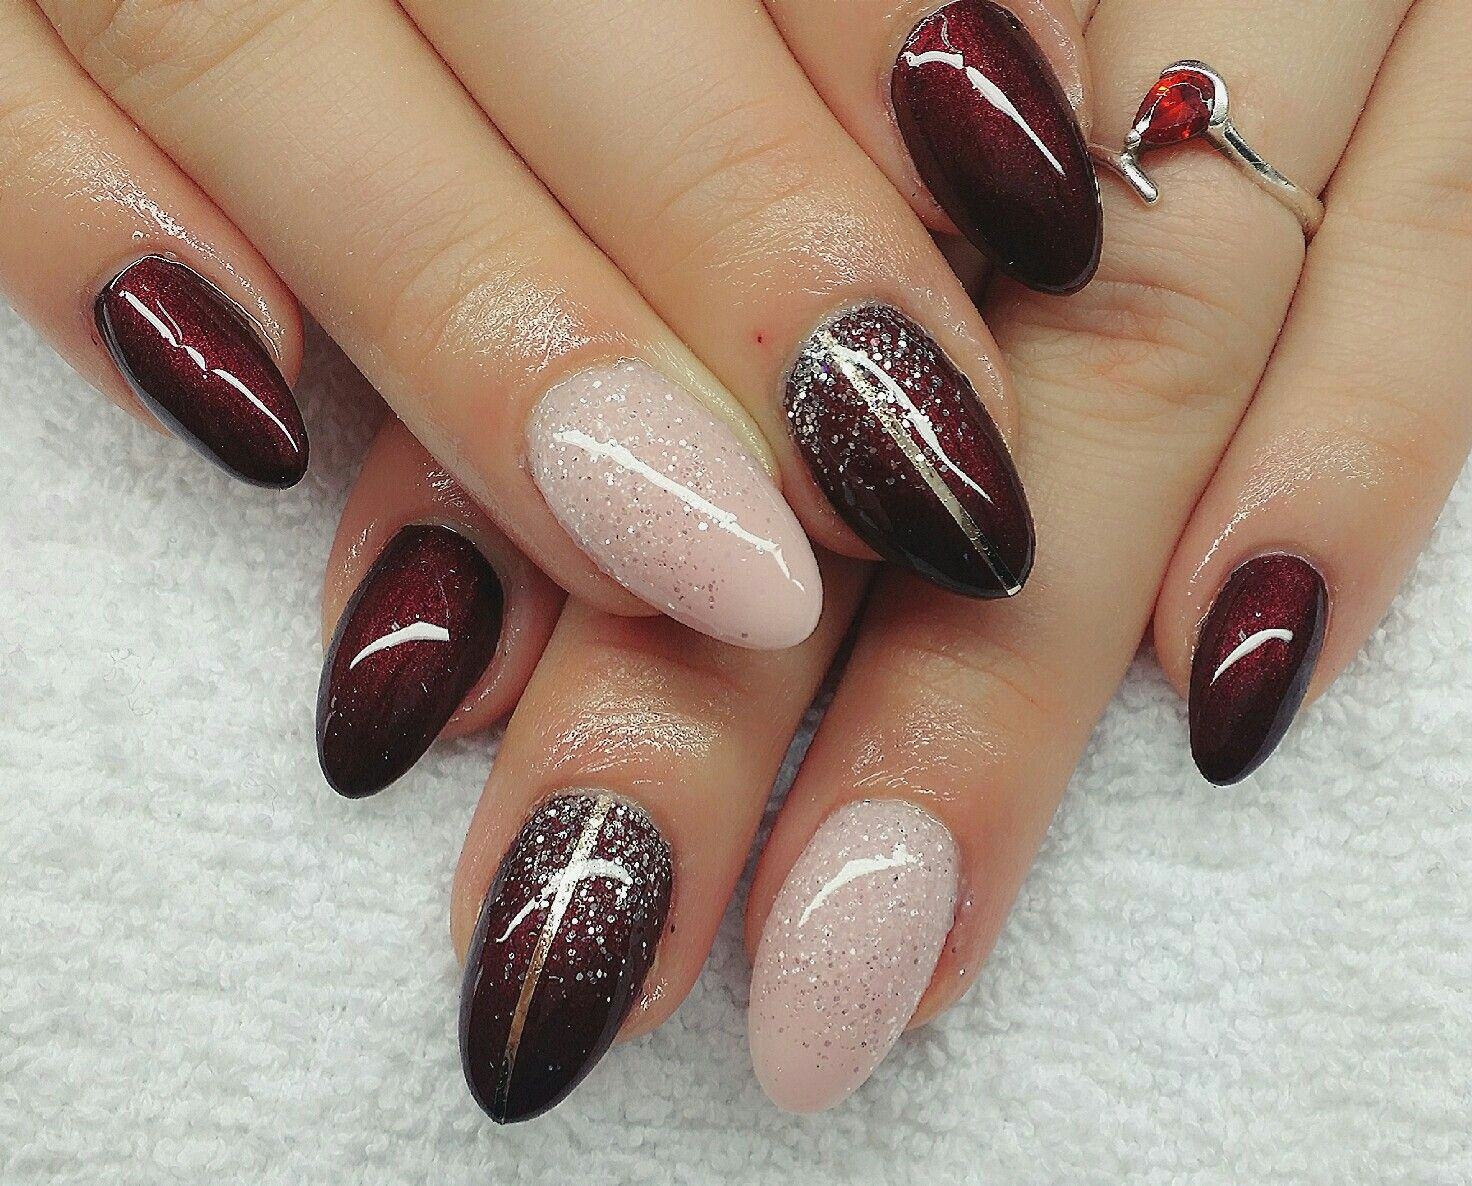 nail design fullcover siebensch n nails pinterest nail color designs fun nails and art nails. Black Bedroom Furniture Sets. Home Design Ideas